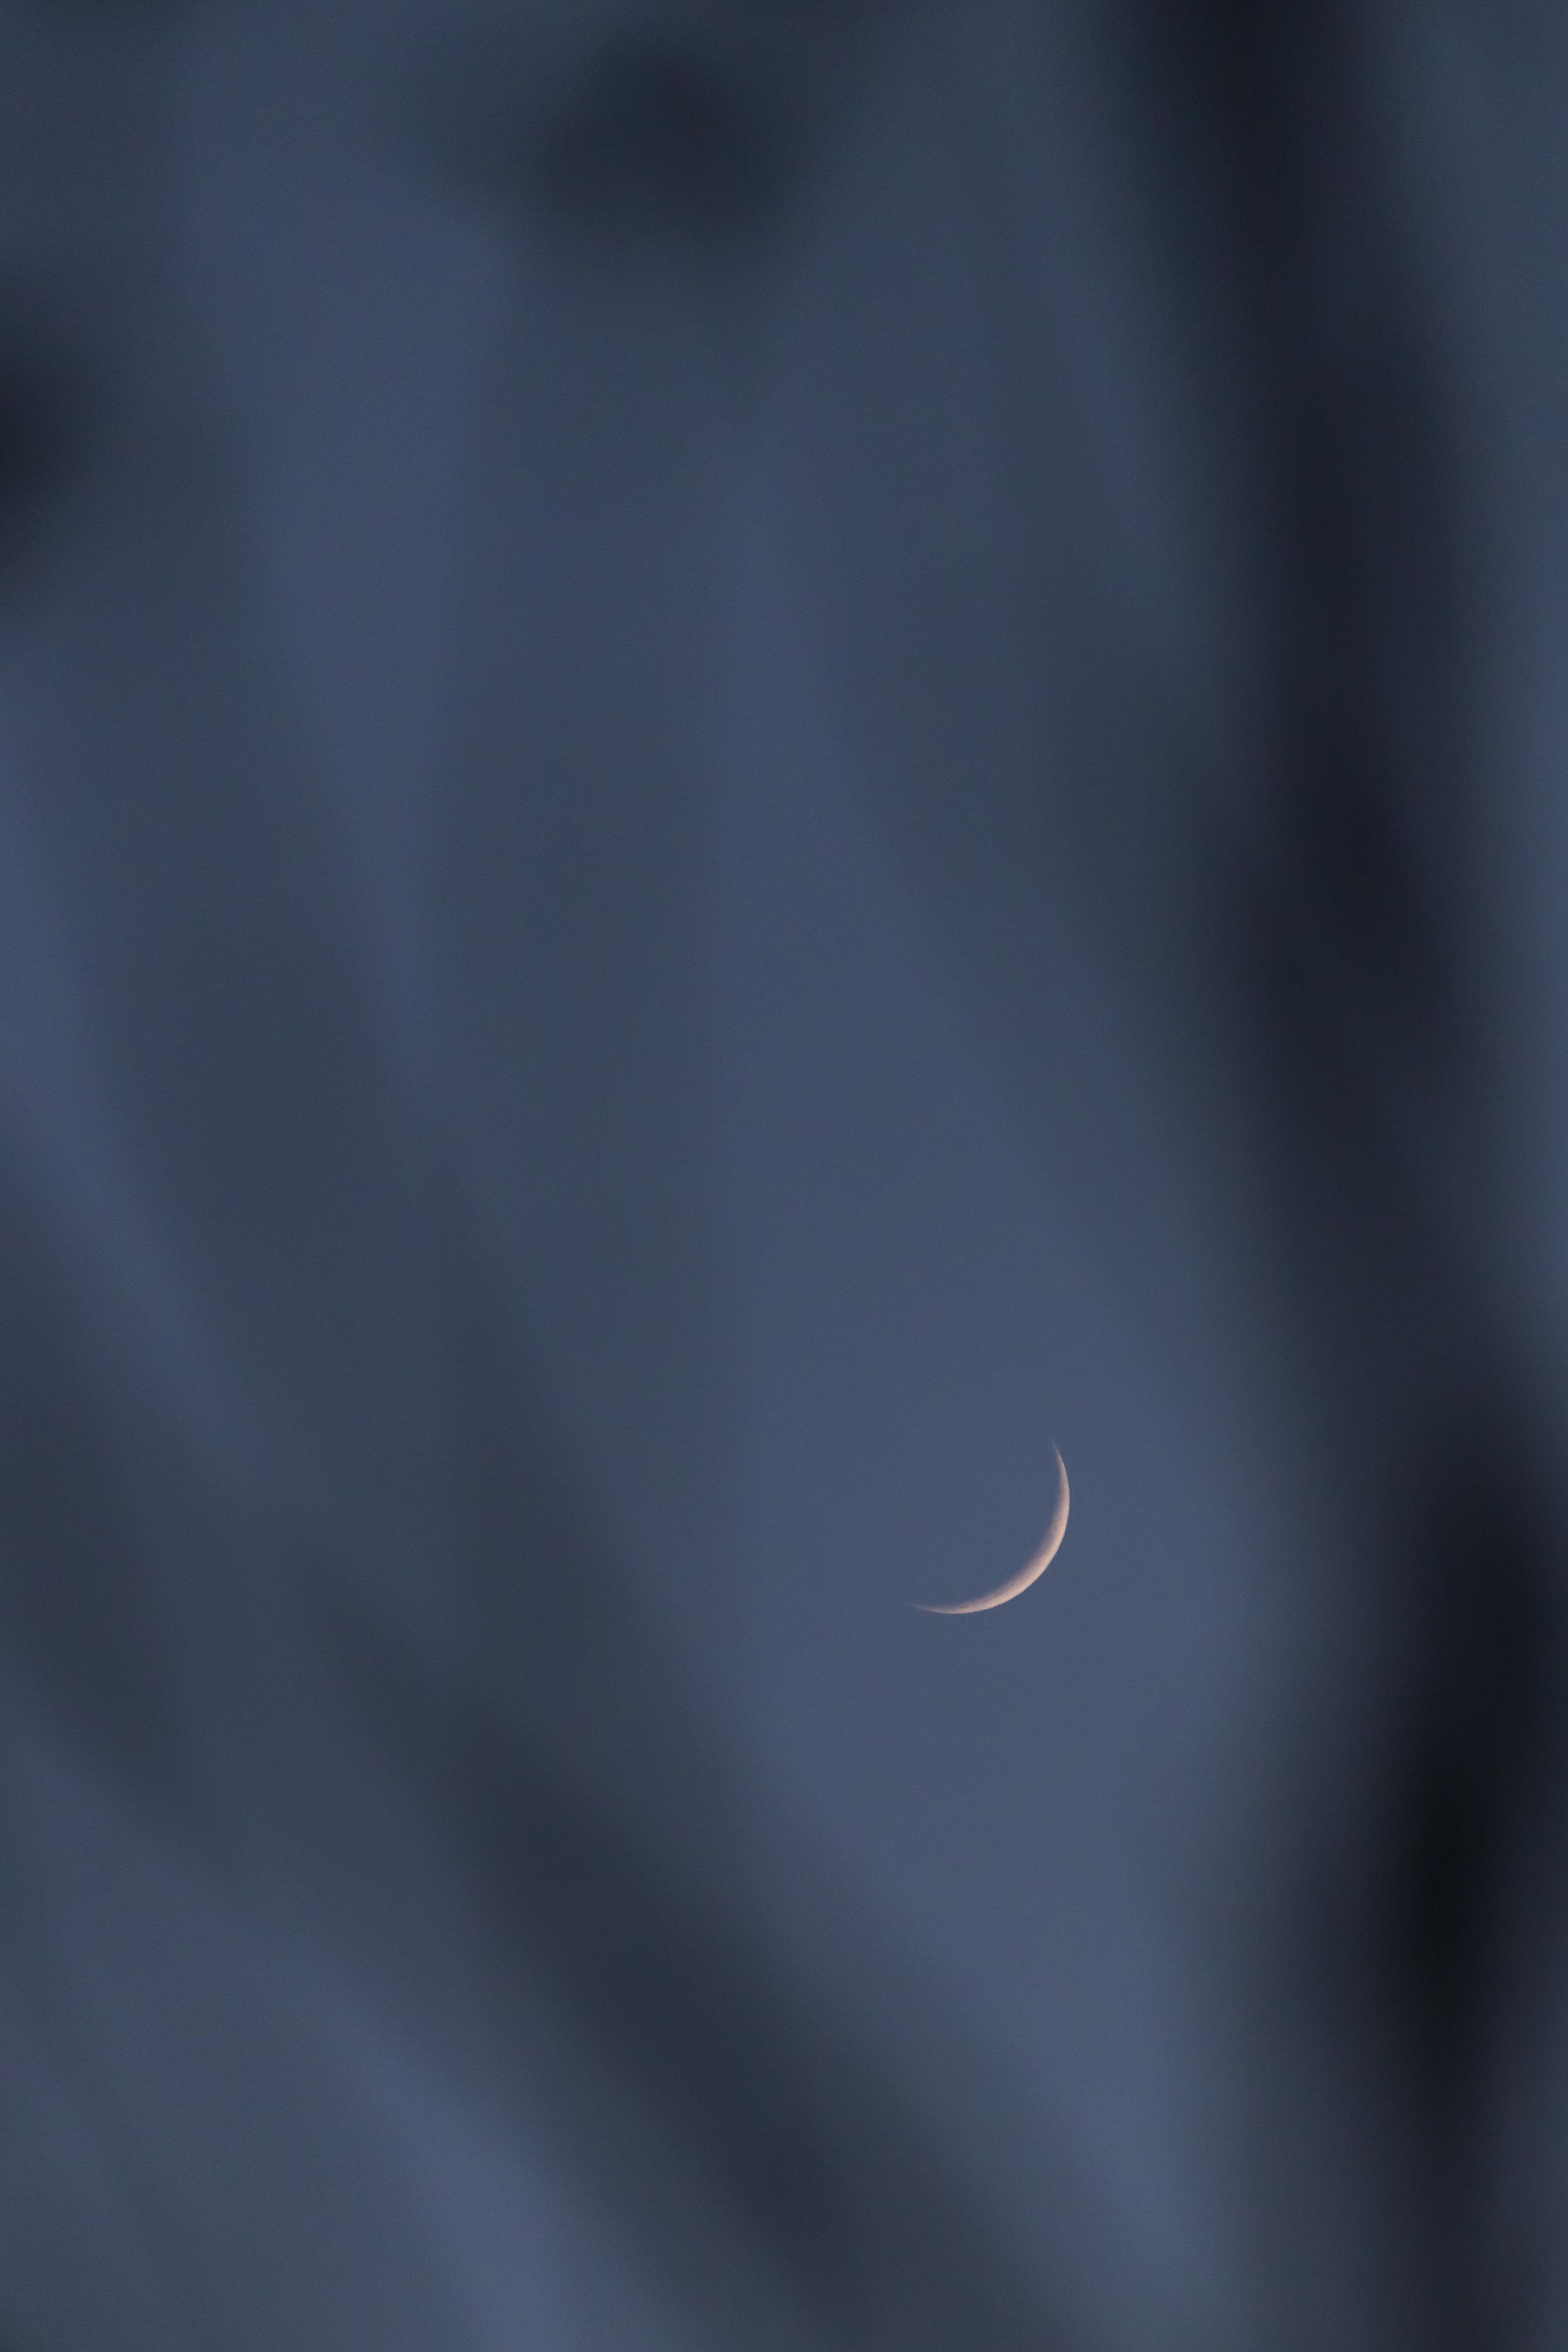 crescent moon in tree - minneapolis